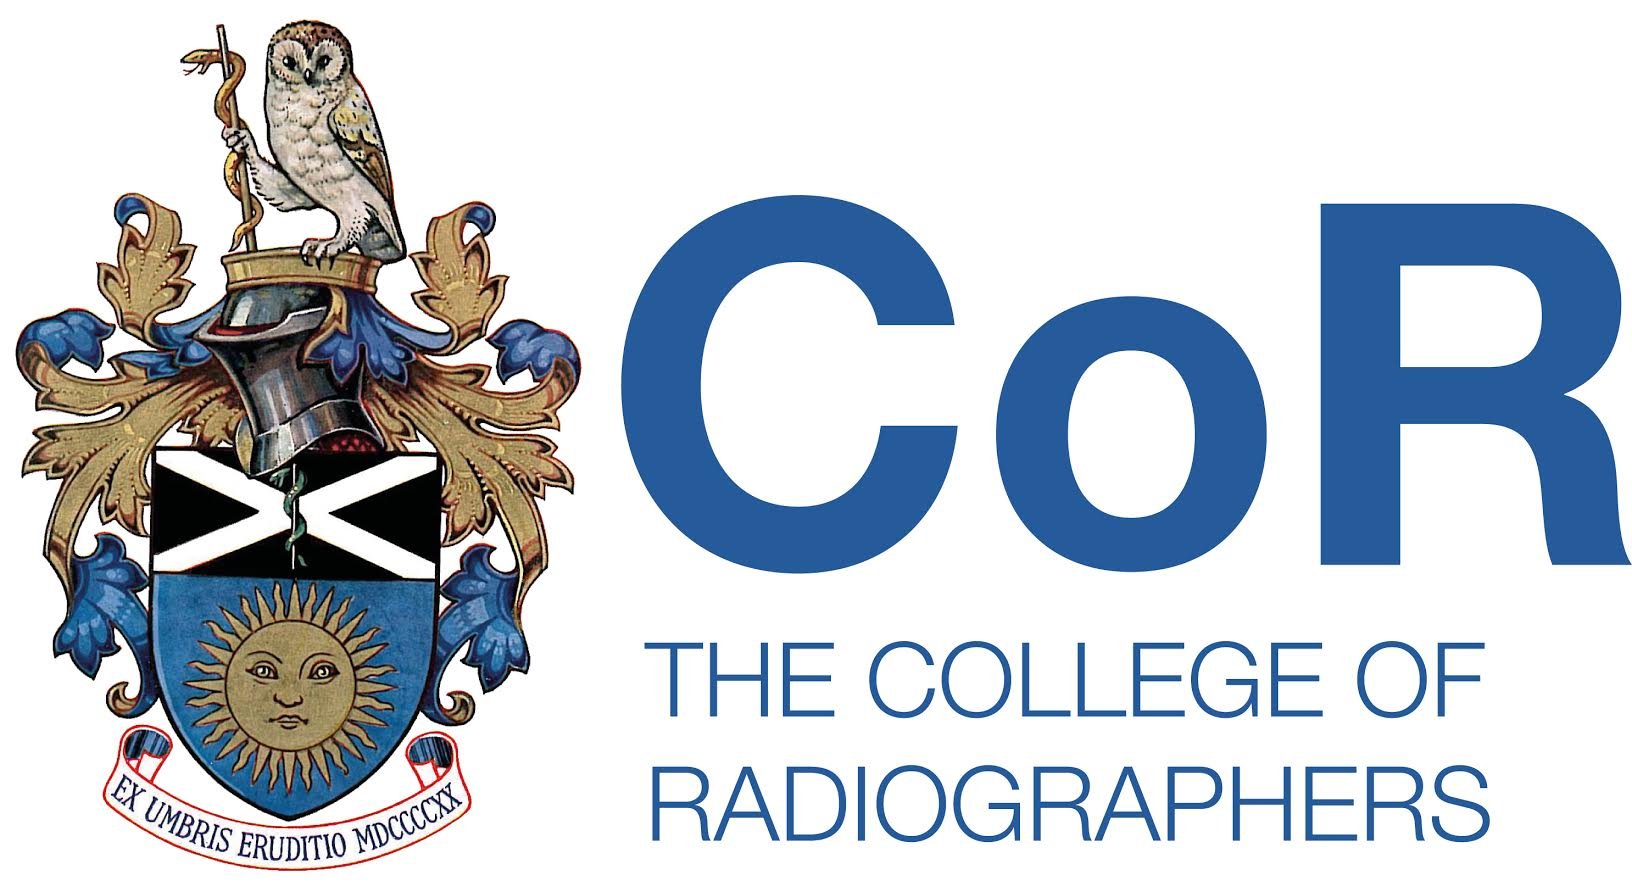 Rad aid and technologists buycottarizona Image collections